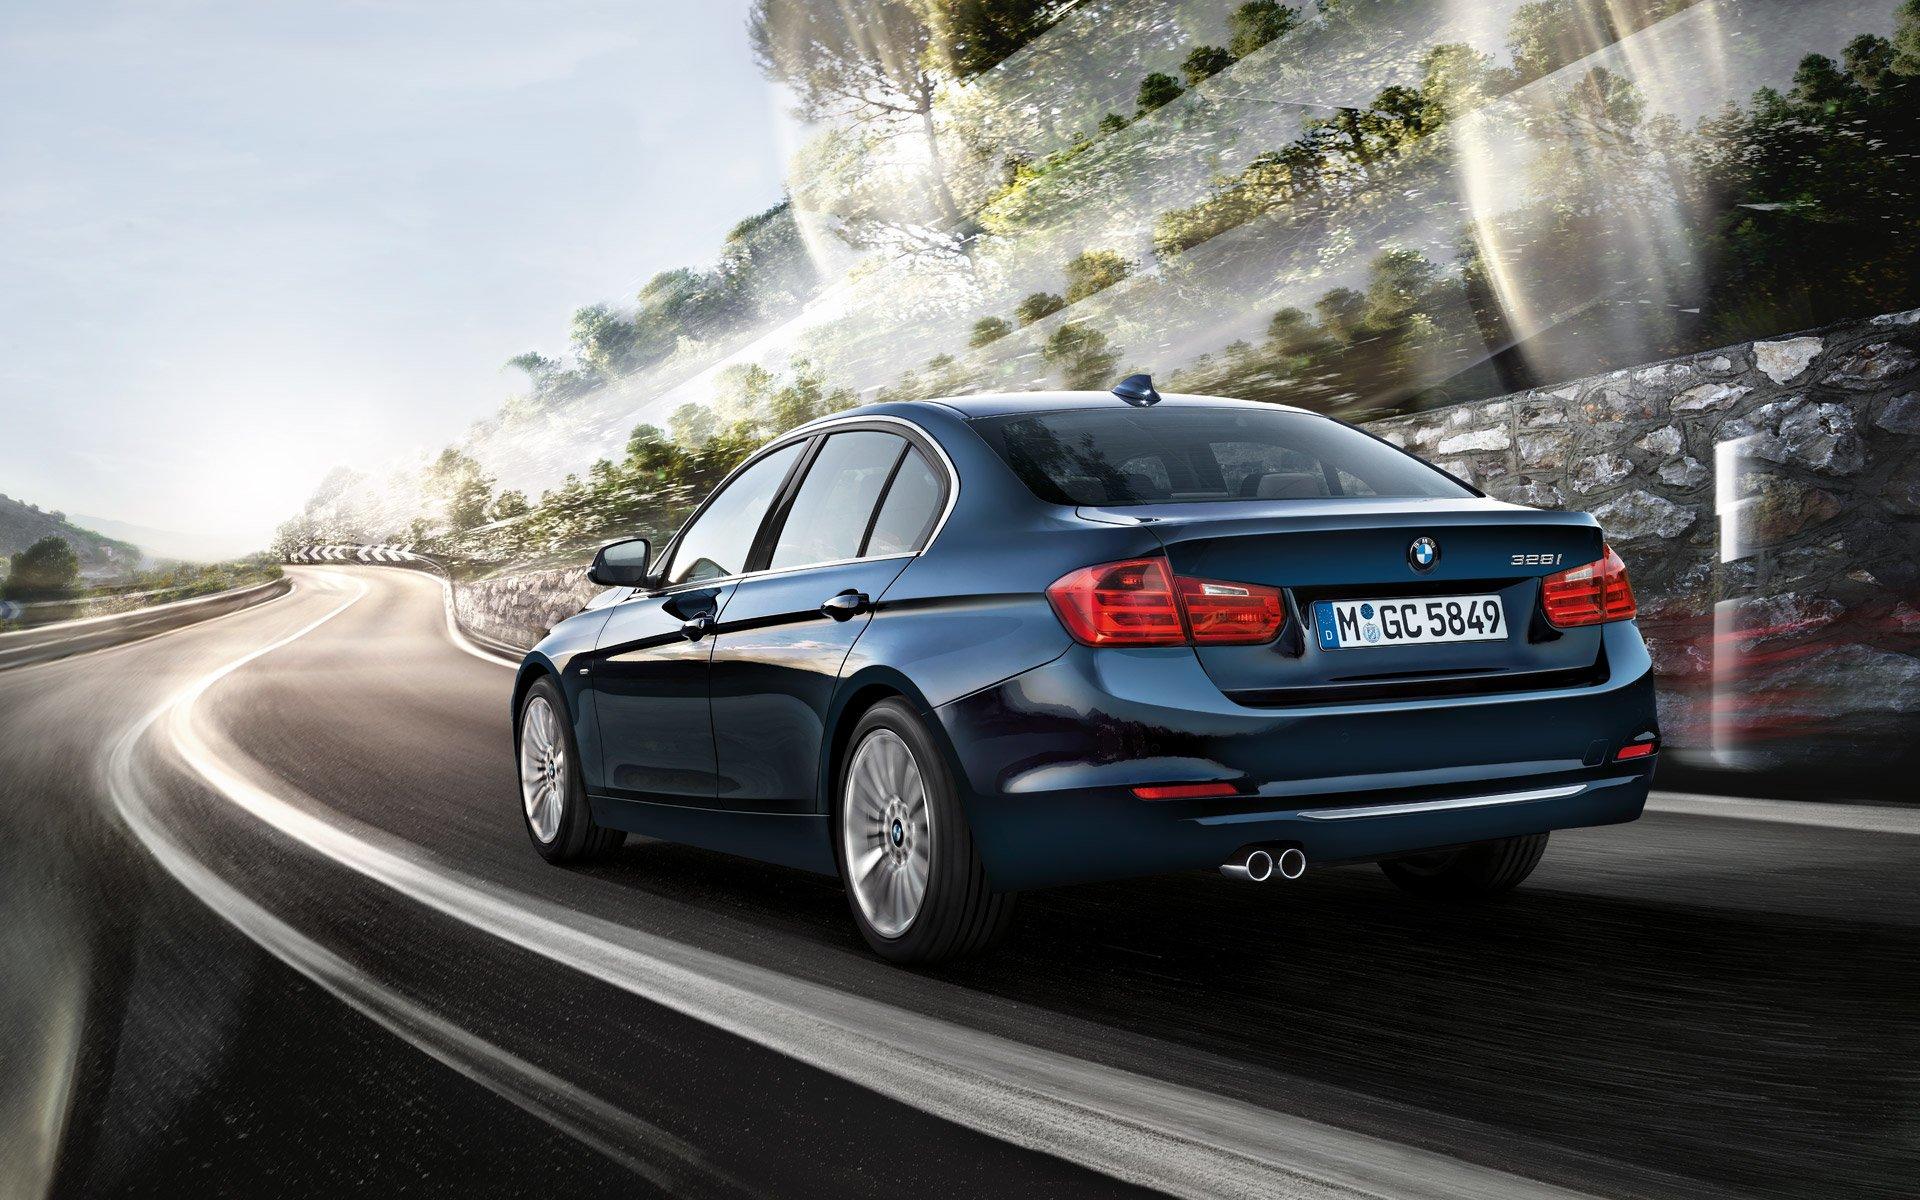 BMW 328i Wallpaper - WallpaperSafari